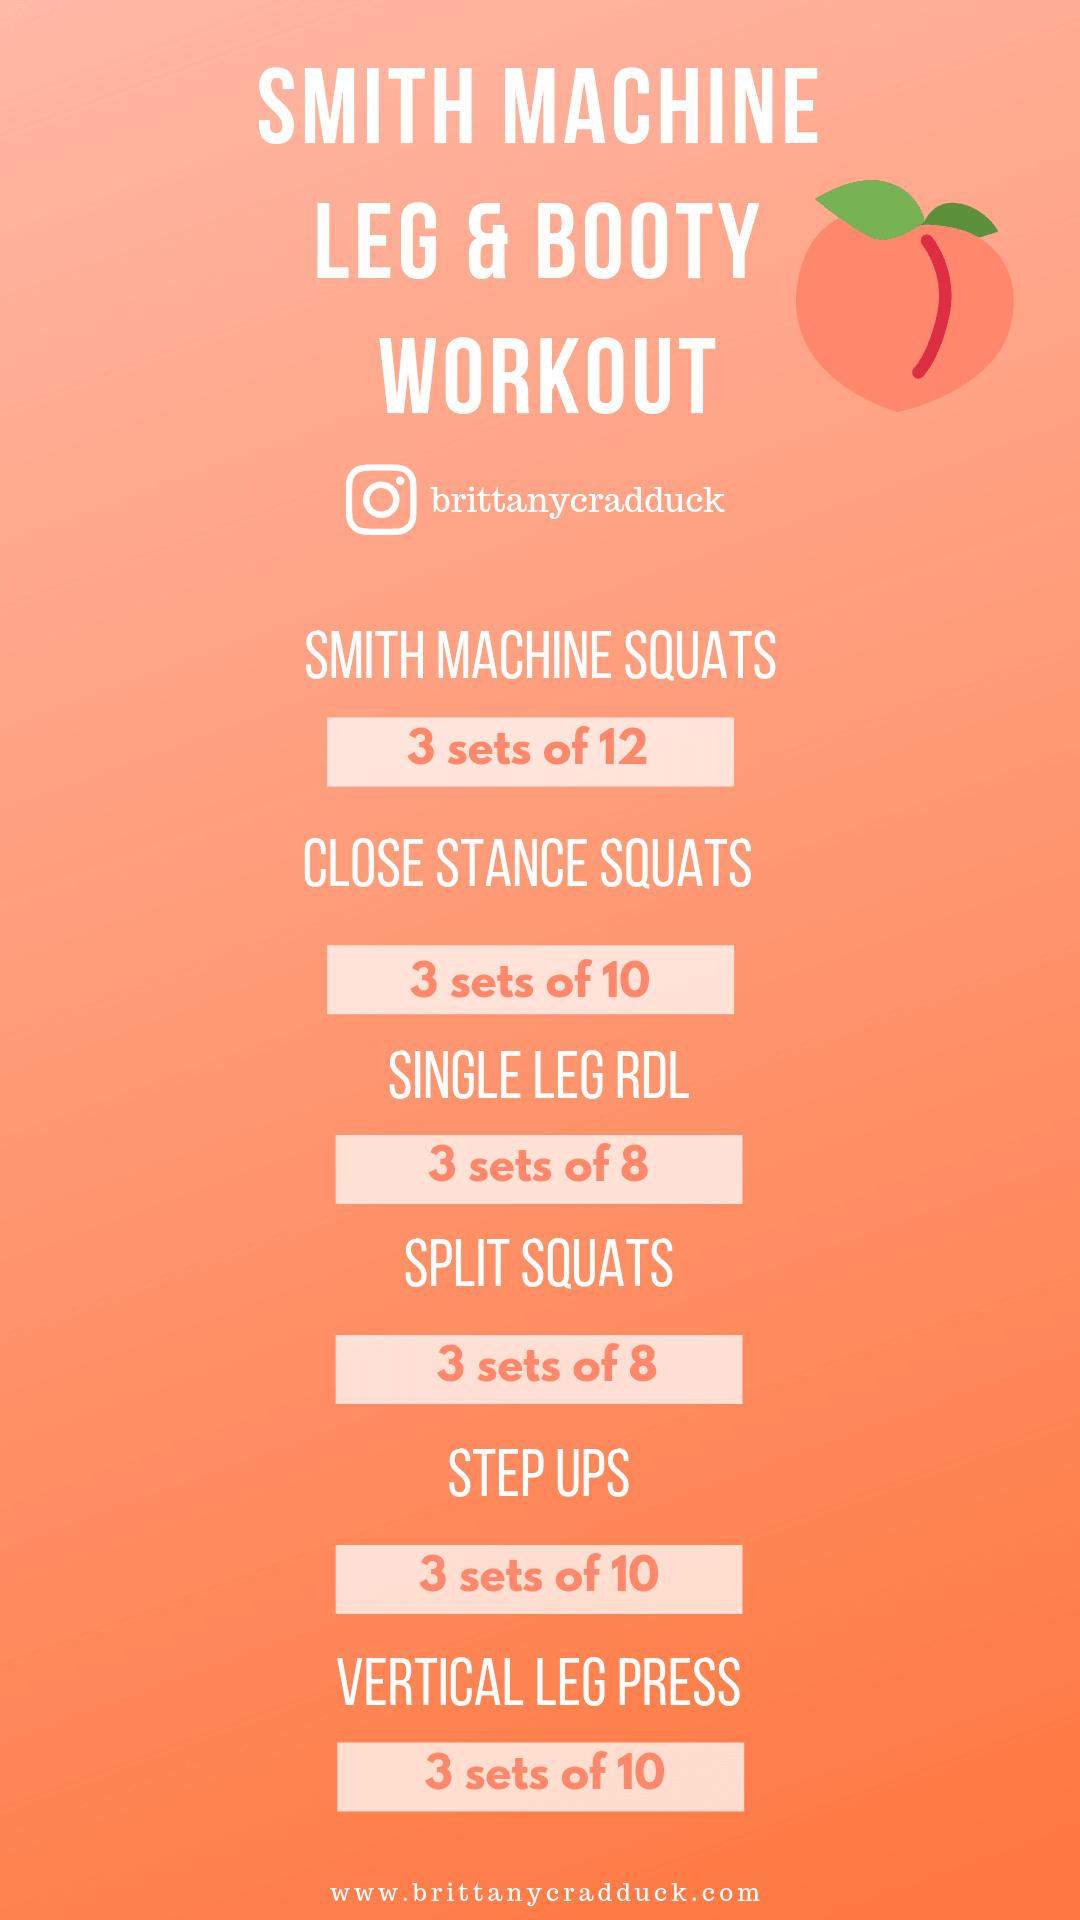 Smith Machine Leg & Booty Workout